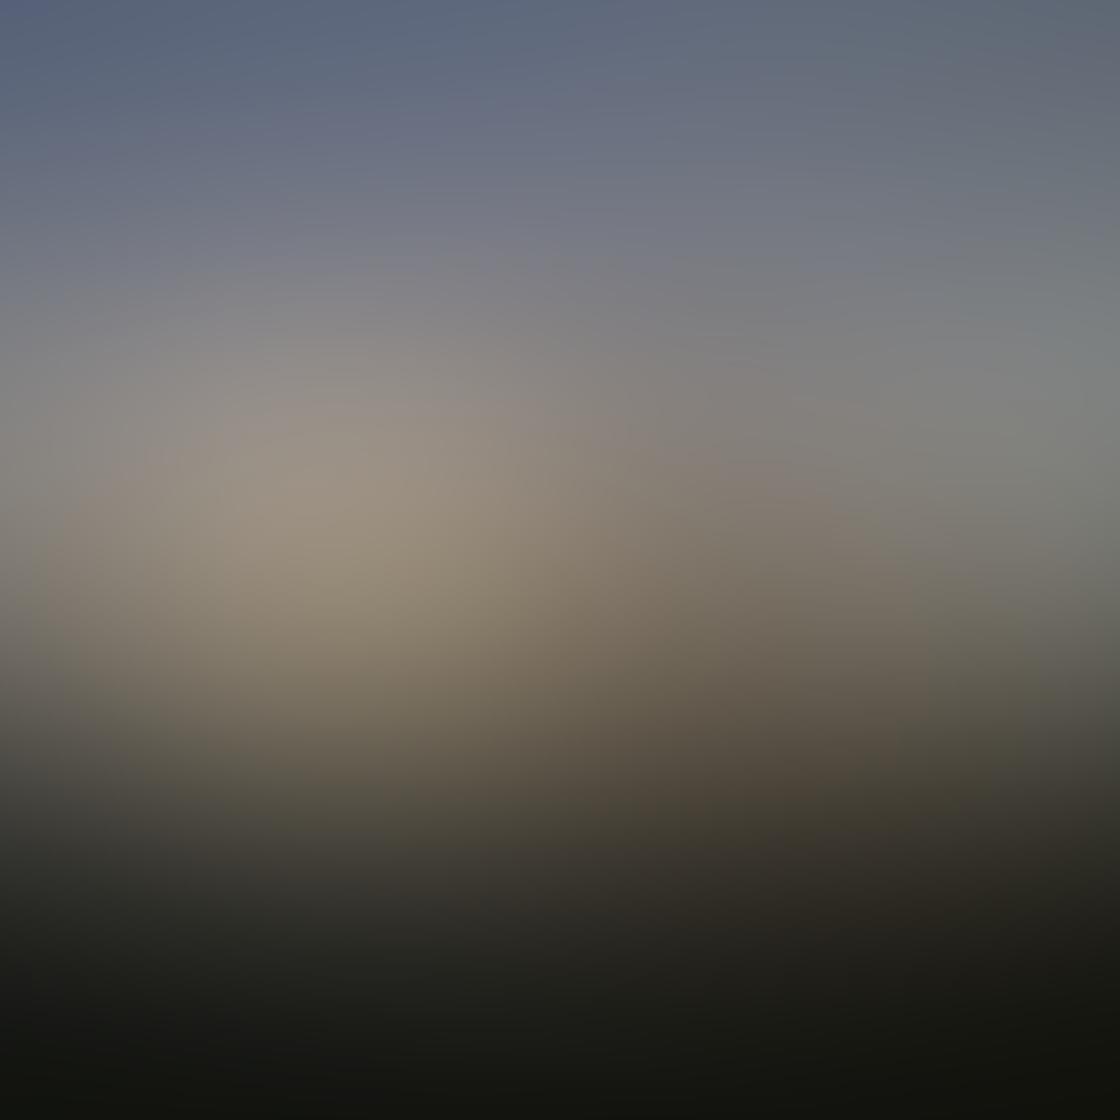 Silhouette iPhone Photos 100